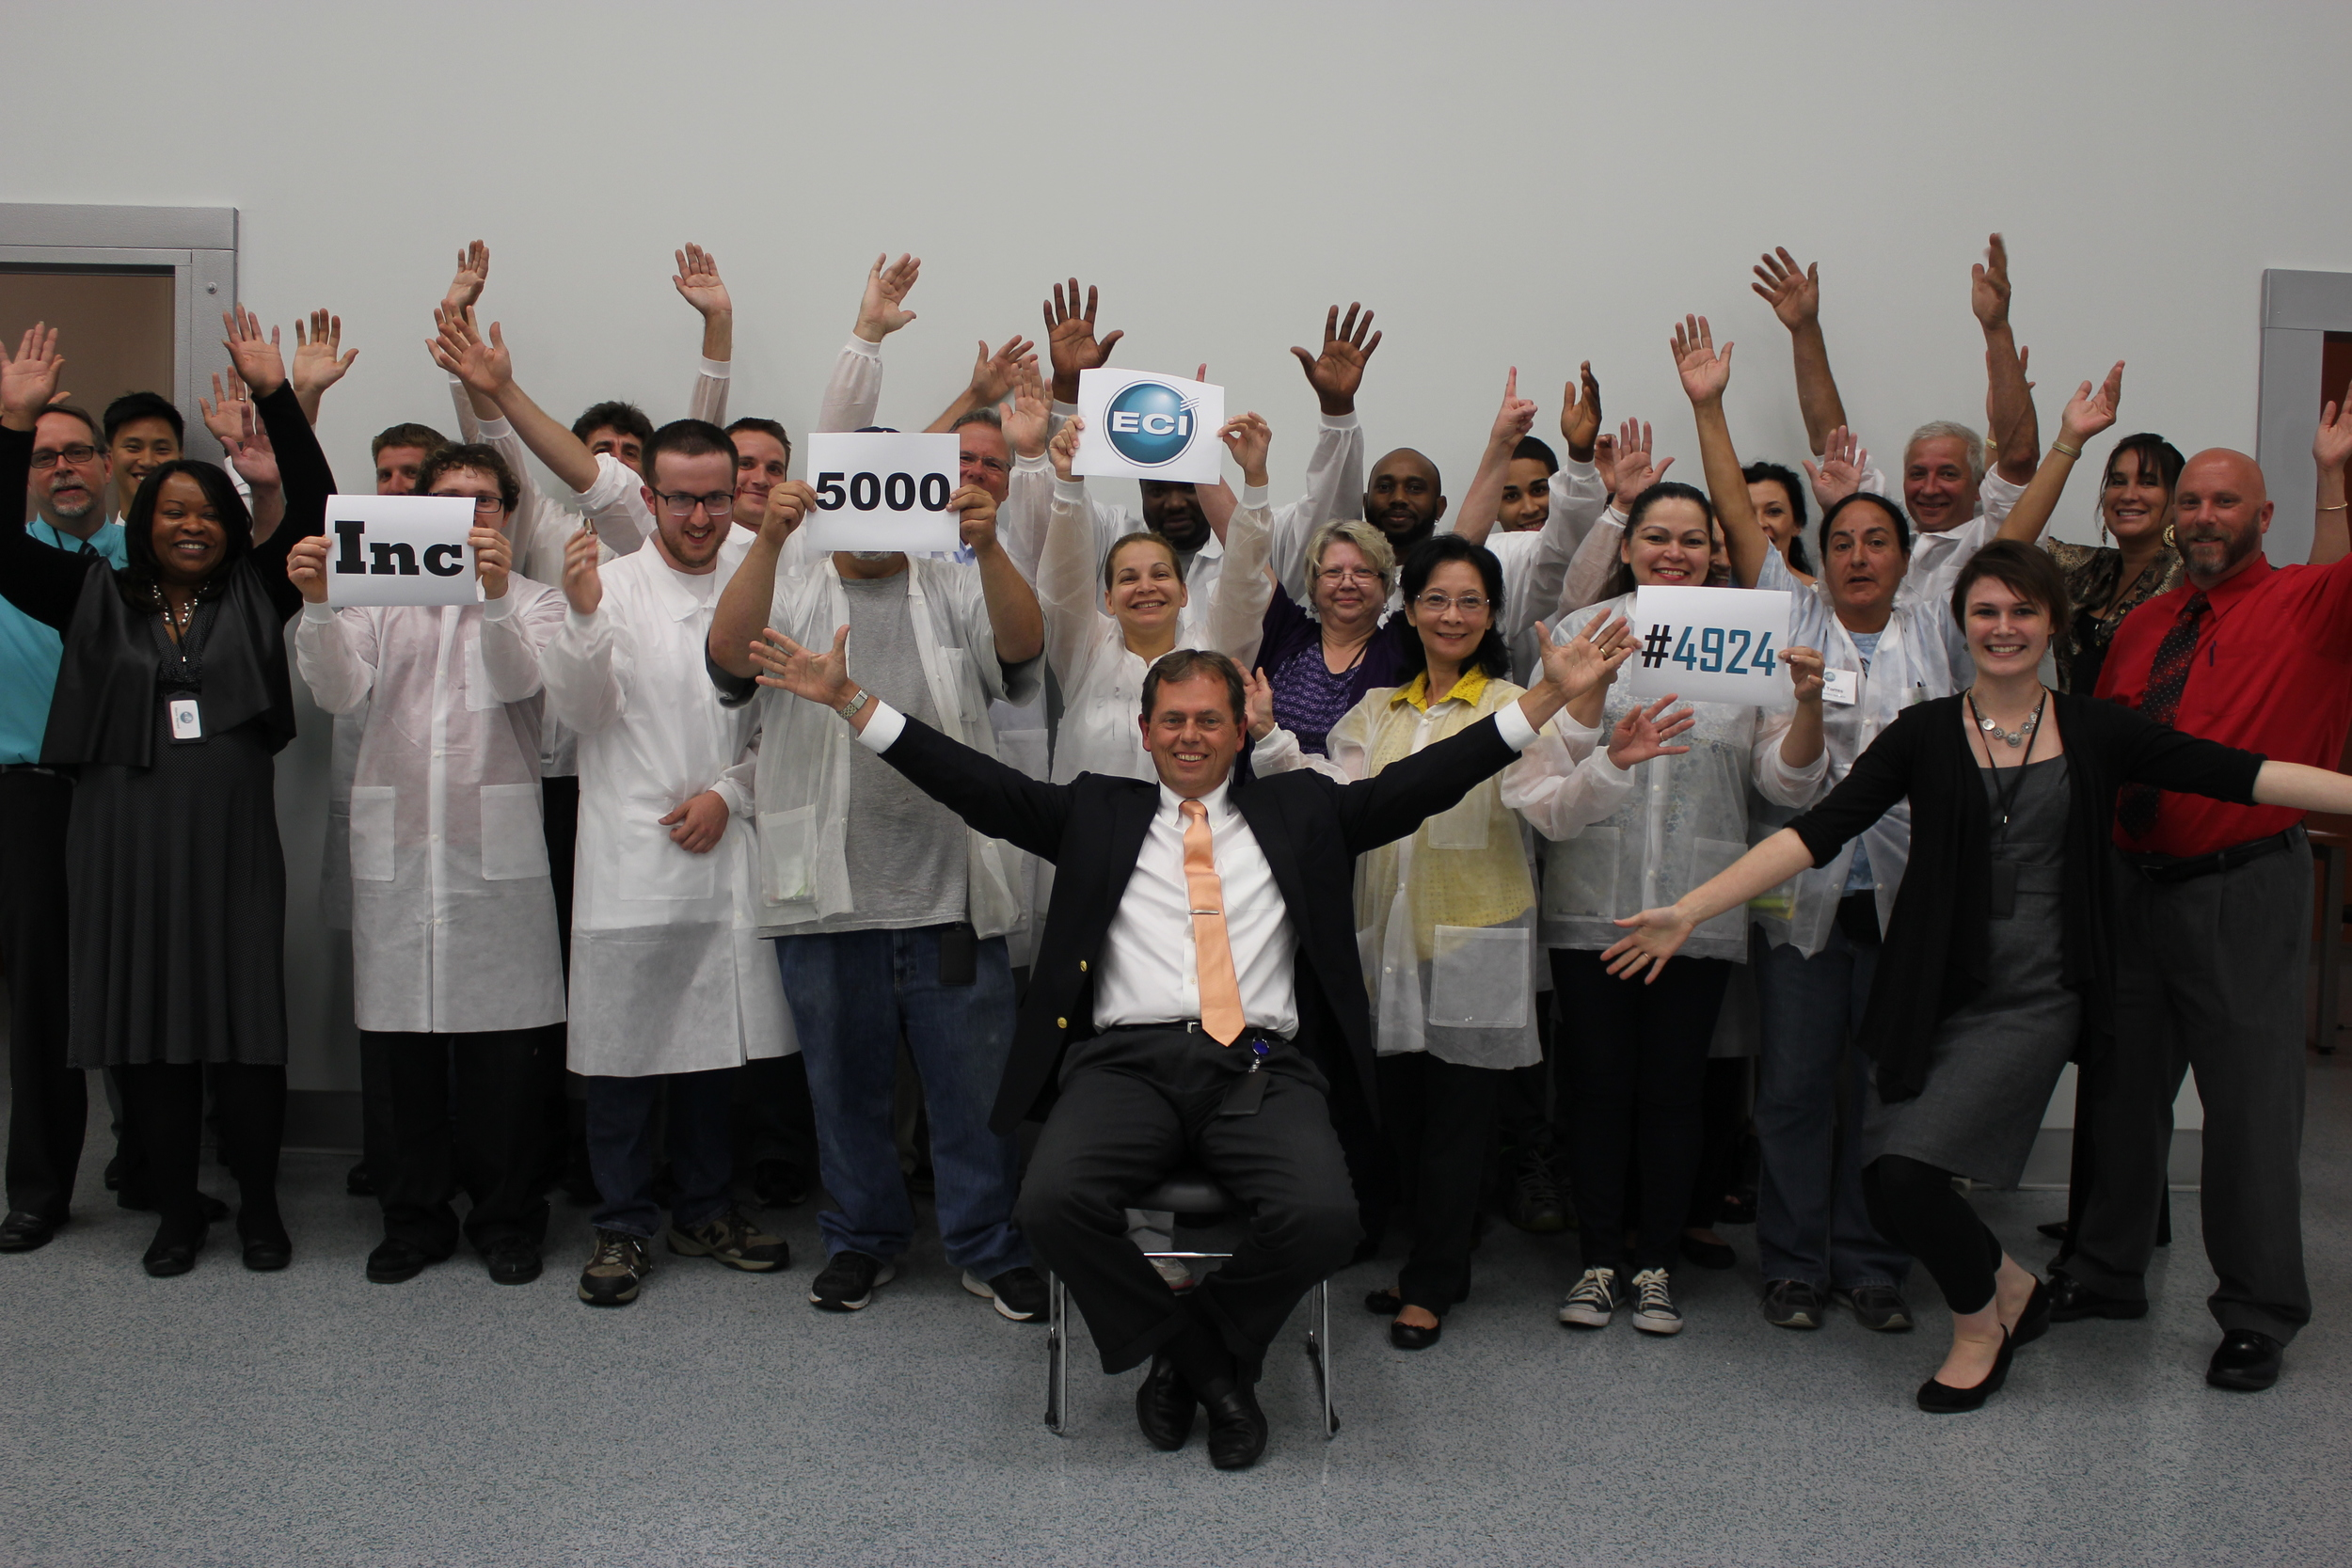 ECI Celebrates Making The Inc. 5000 in 2015